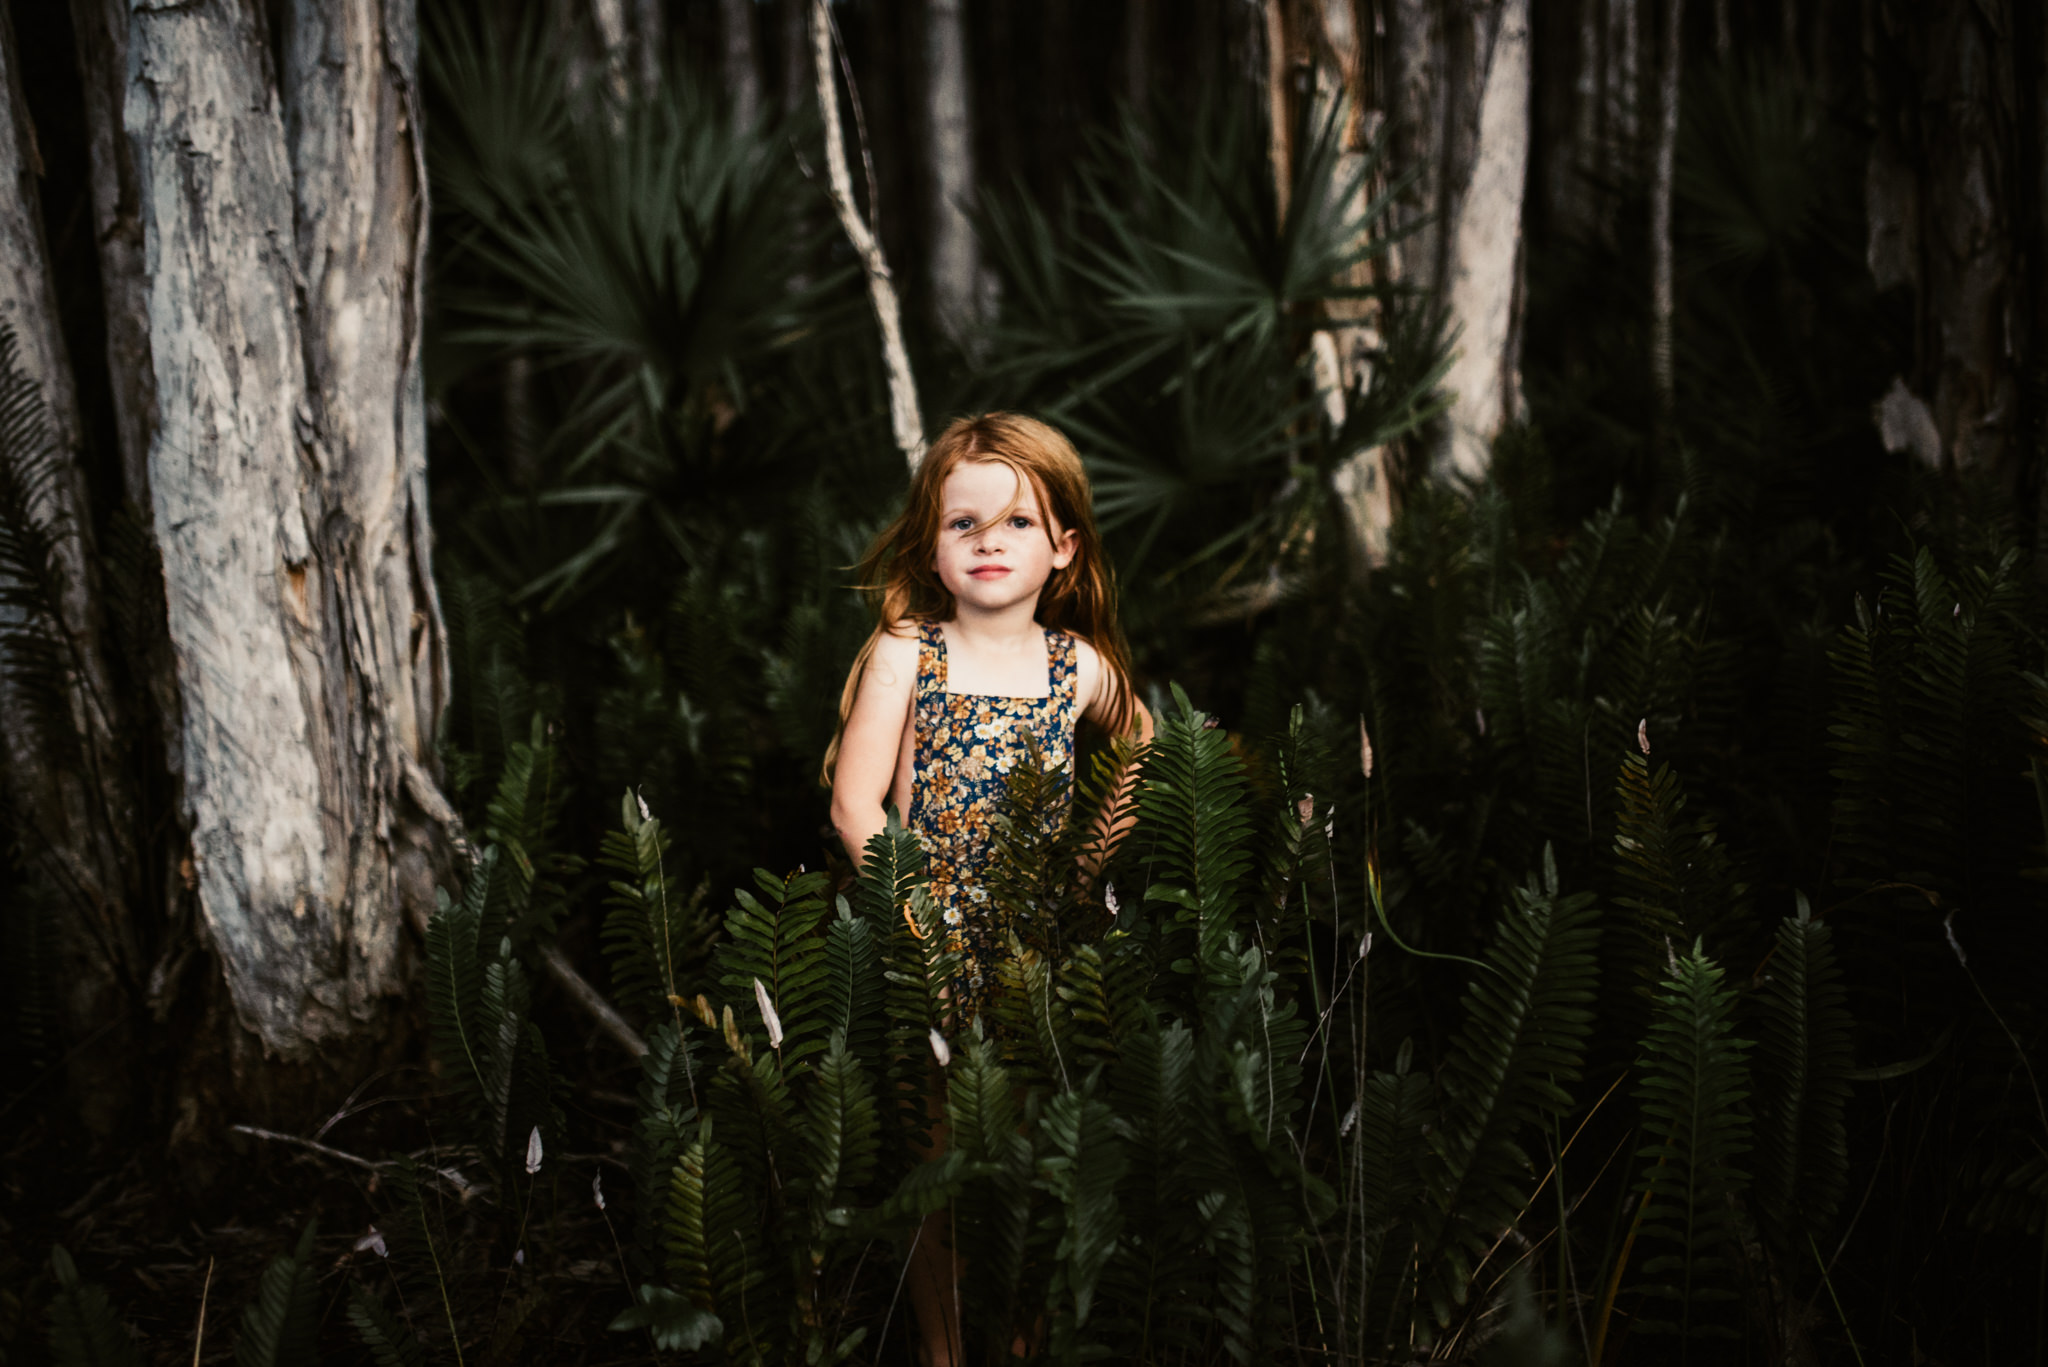 twyla jones photography - treasure coast florida - childrens adventure clothing commercial shoot--57.jpg